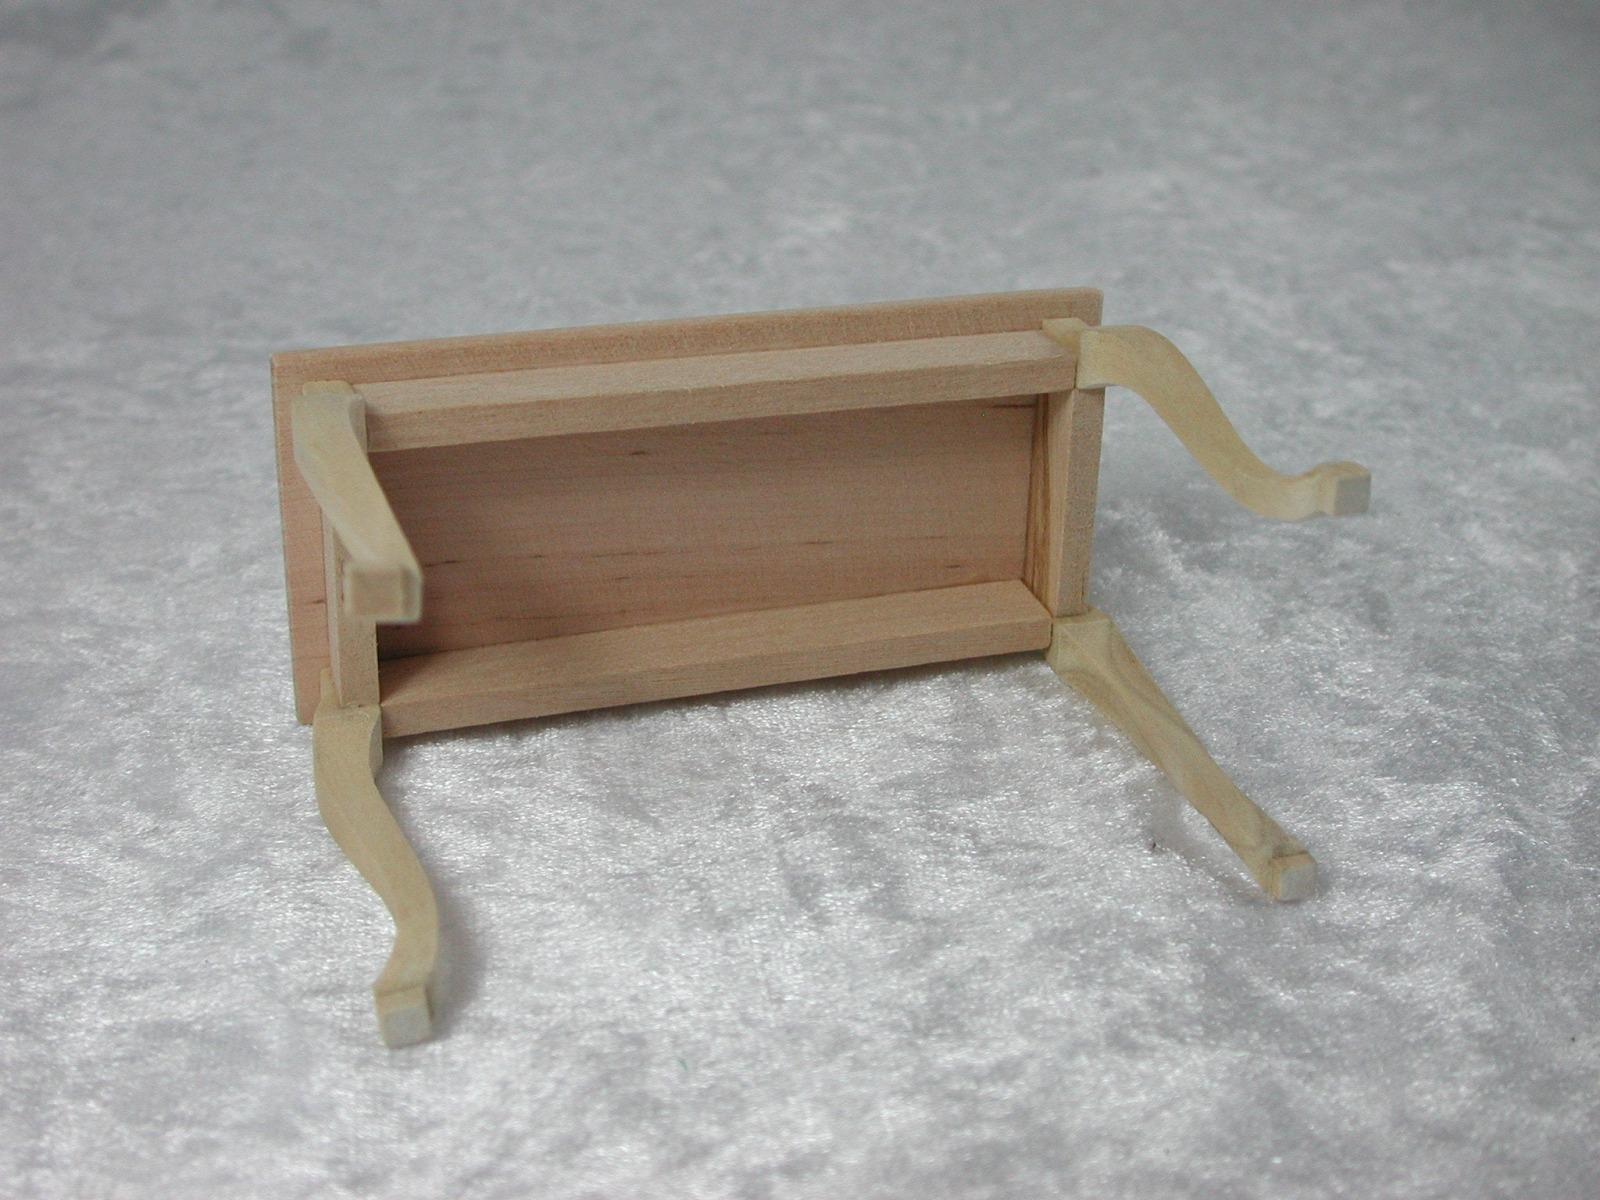 Beistelltisch 1:12 Miniatur 4